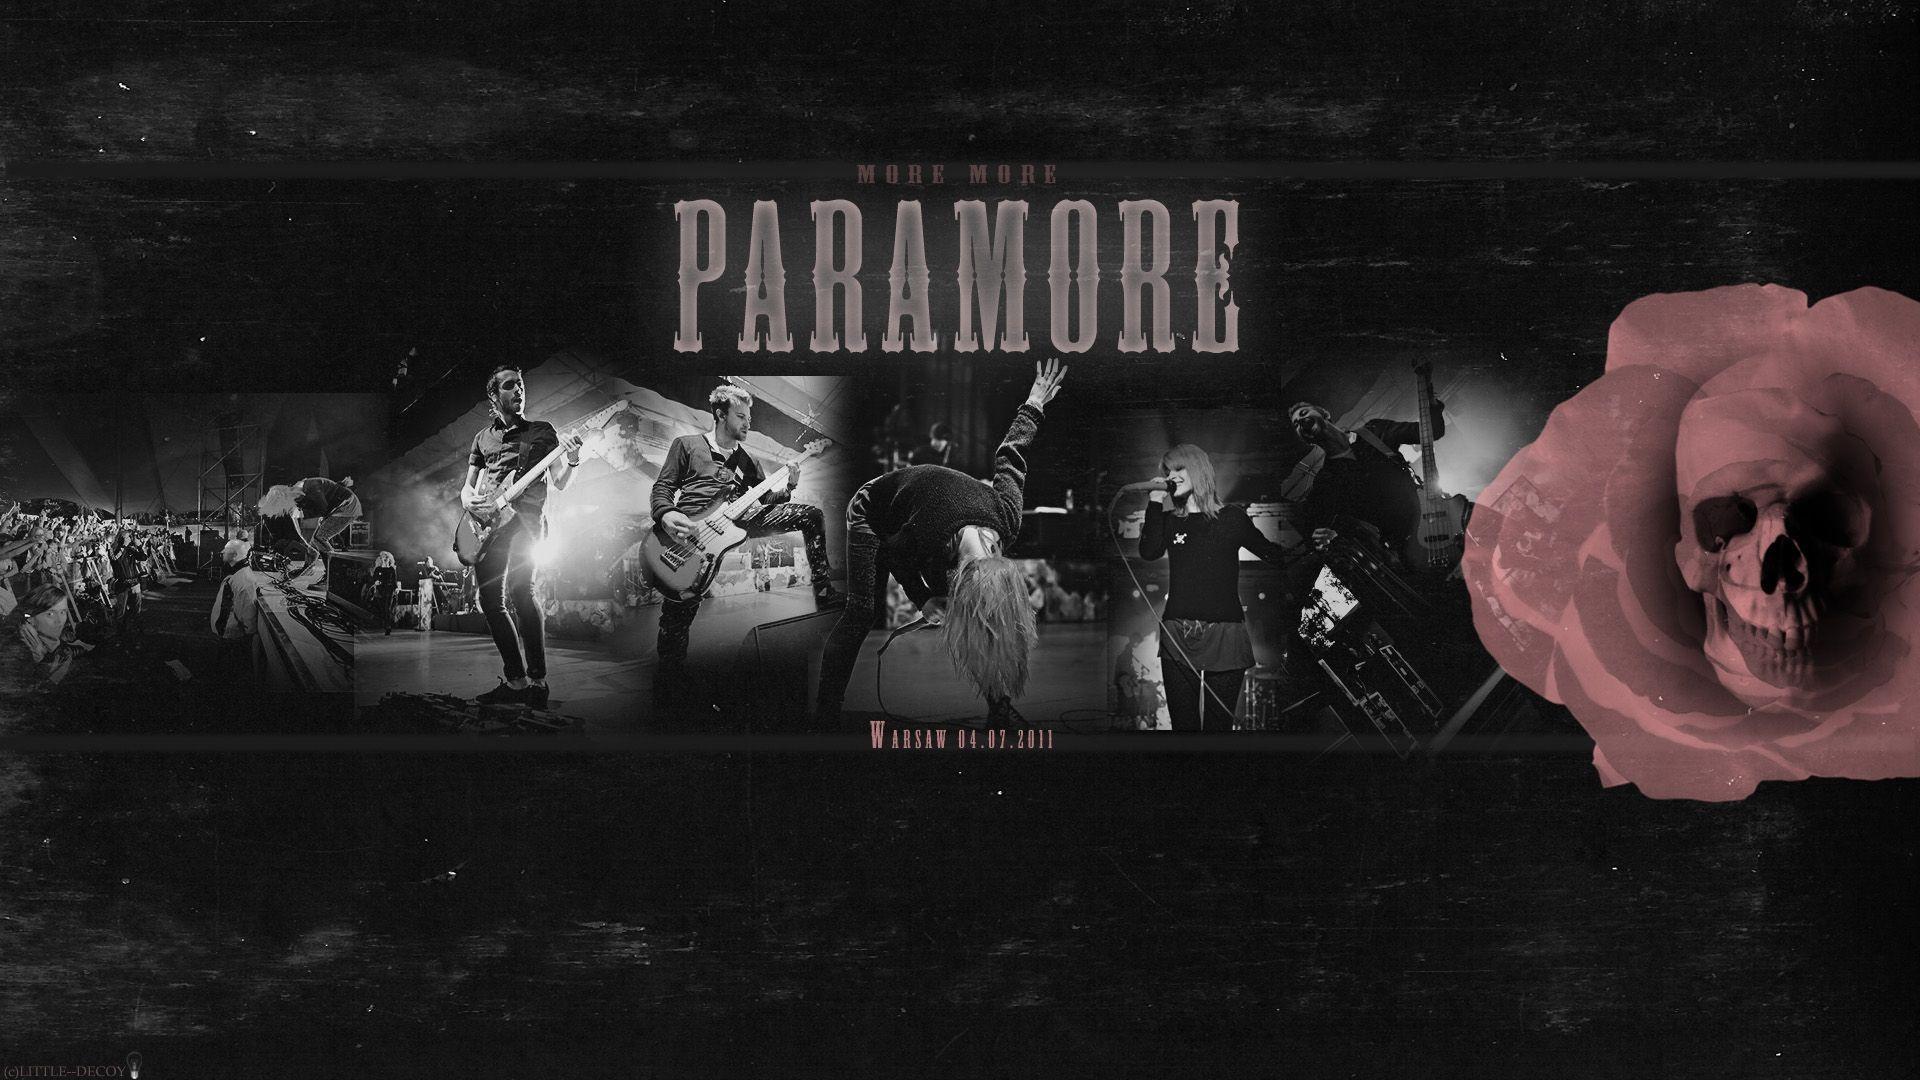 Paramore 2015 Wallpapers Wallpaper Cave